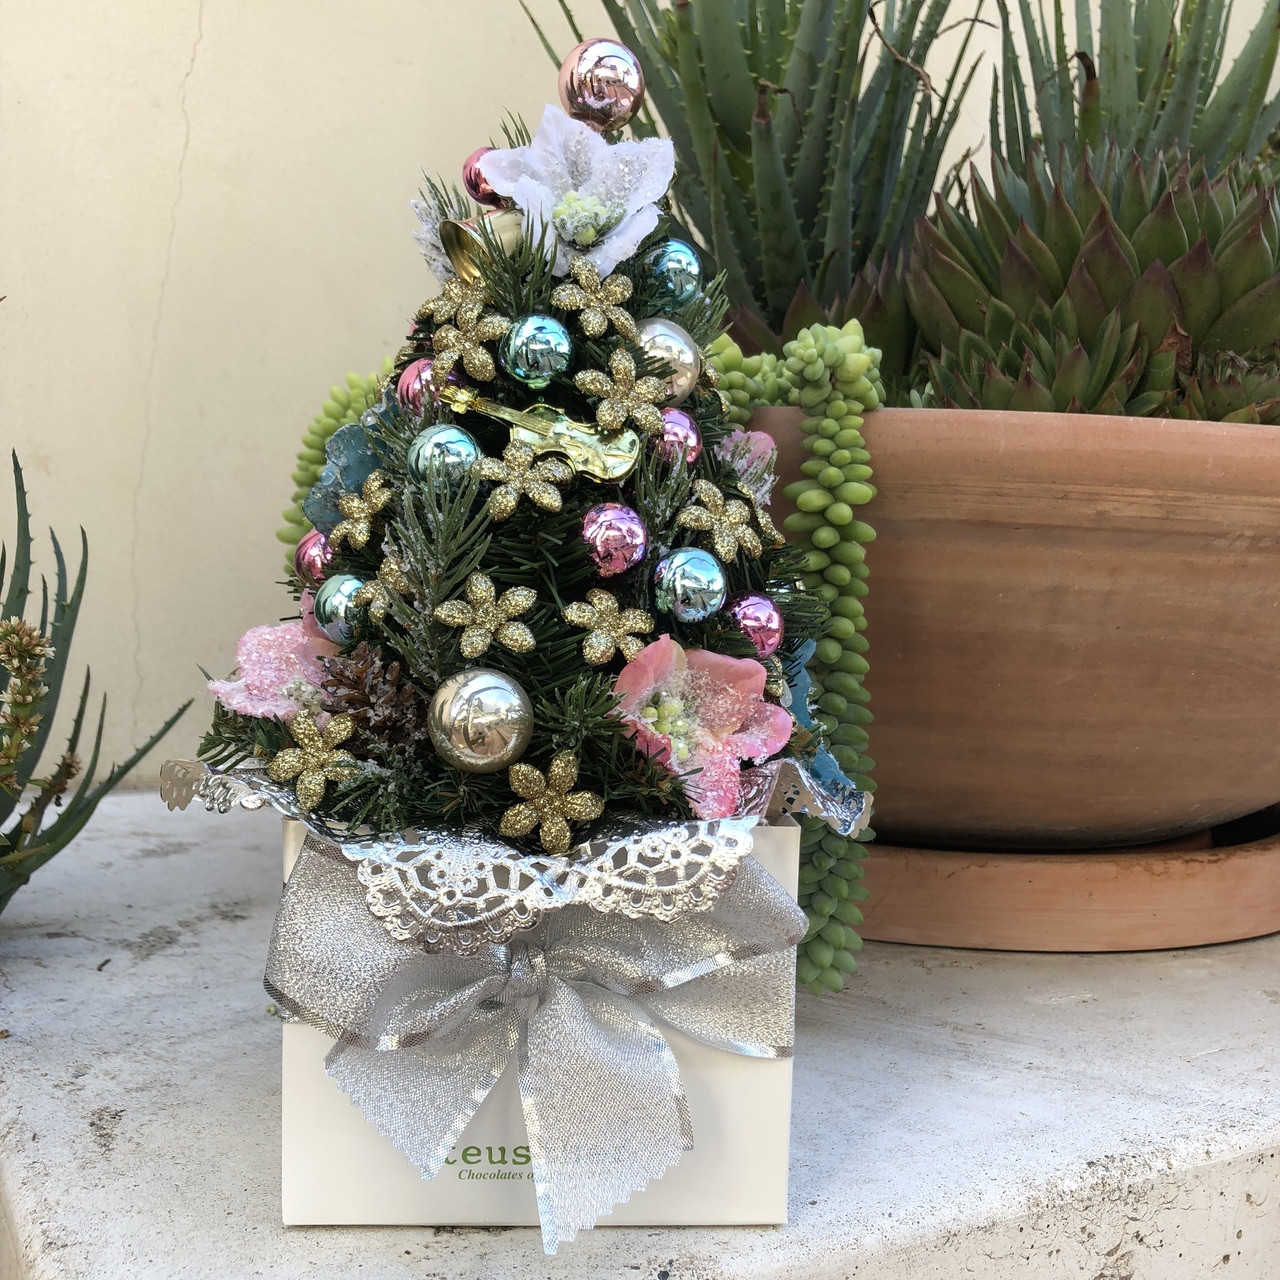 Christmas Snow Collection 25, 32 and 48 pieces - Teuscher San Diego